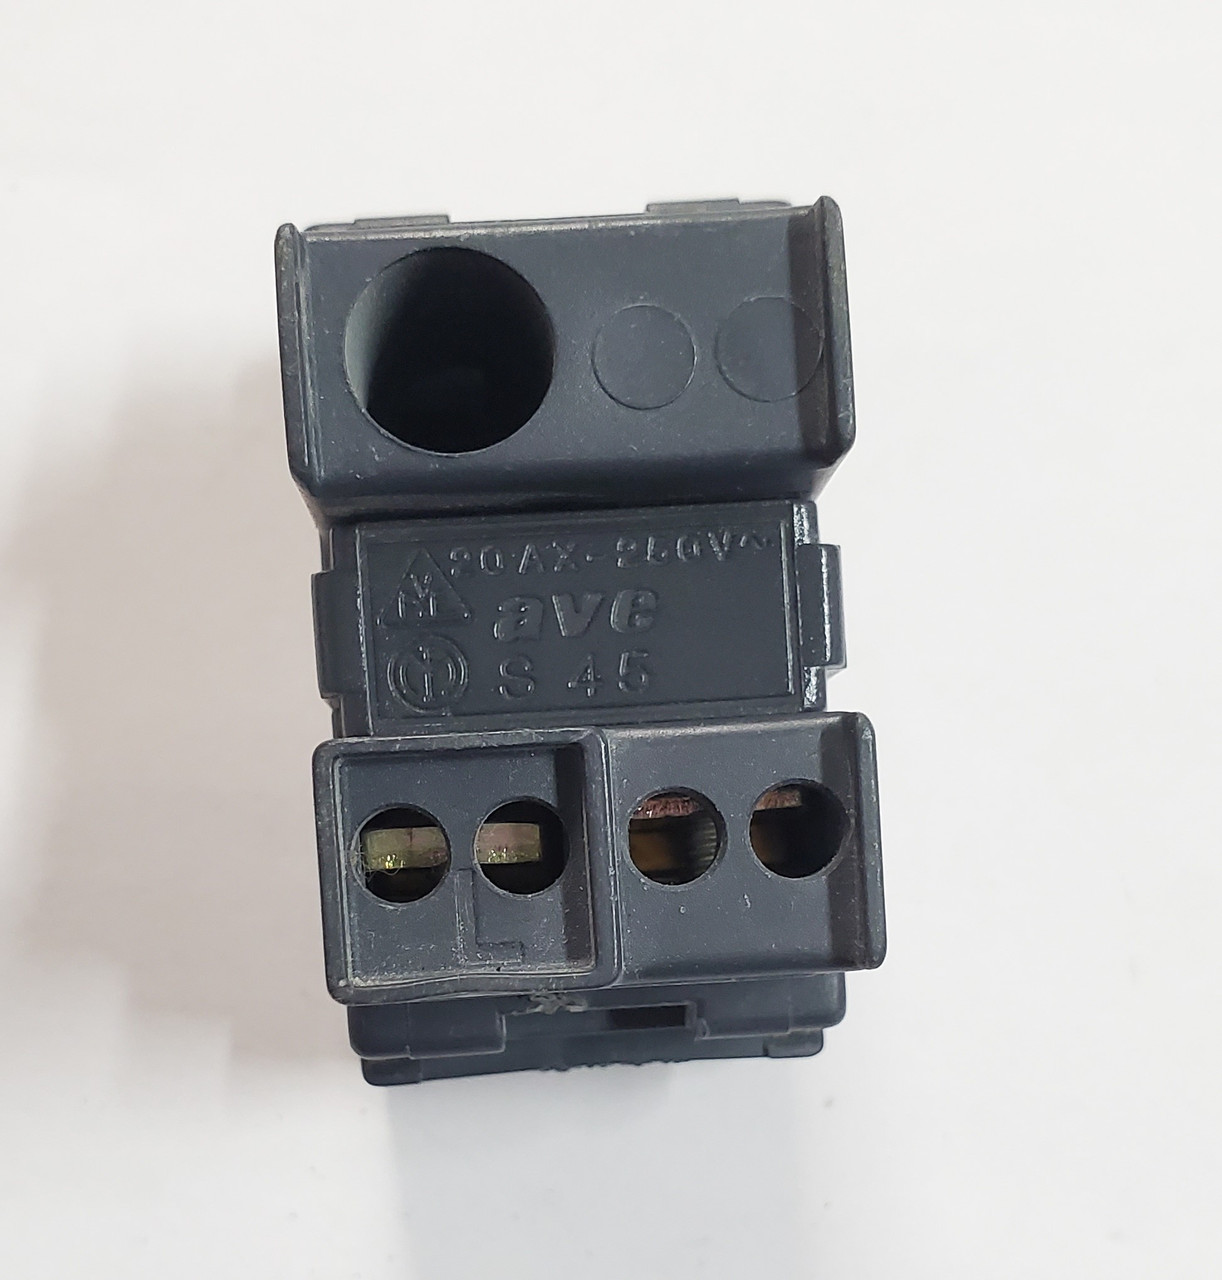 Dimmer Switch (1W)